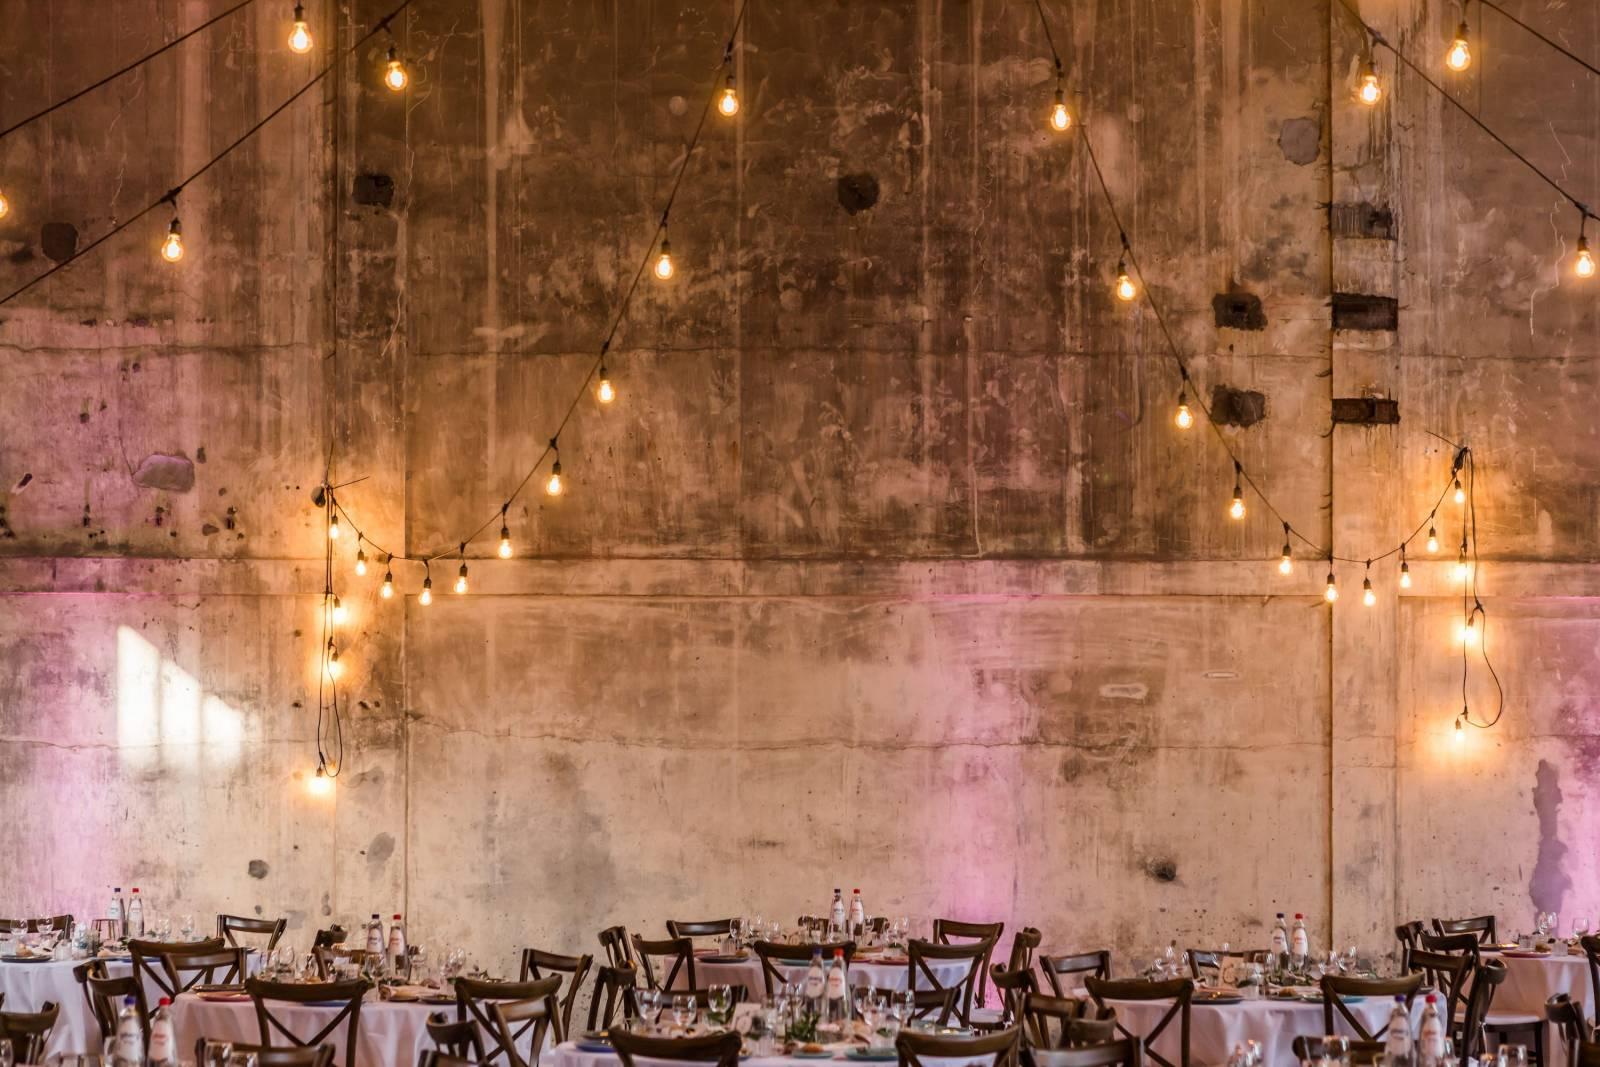 Transfo - Feestzaal - Trouwzaal - House of Weddings - 18